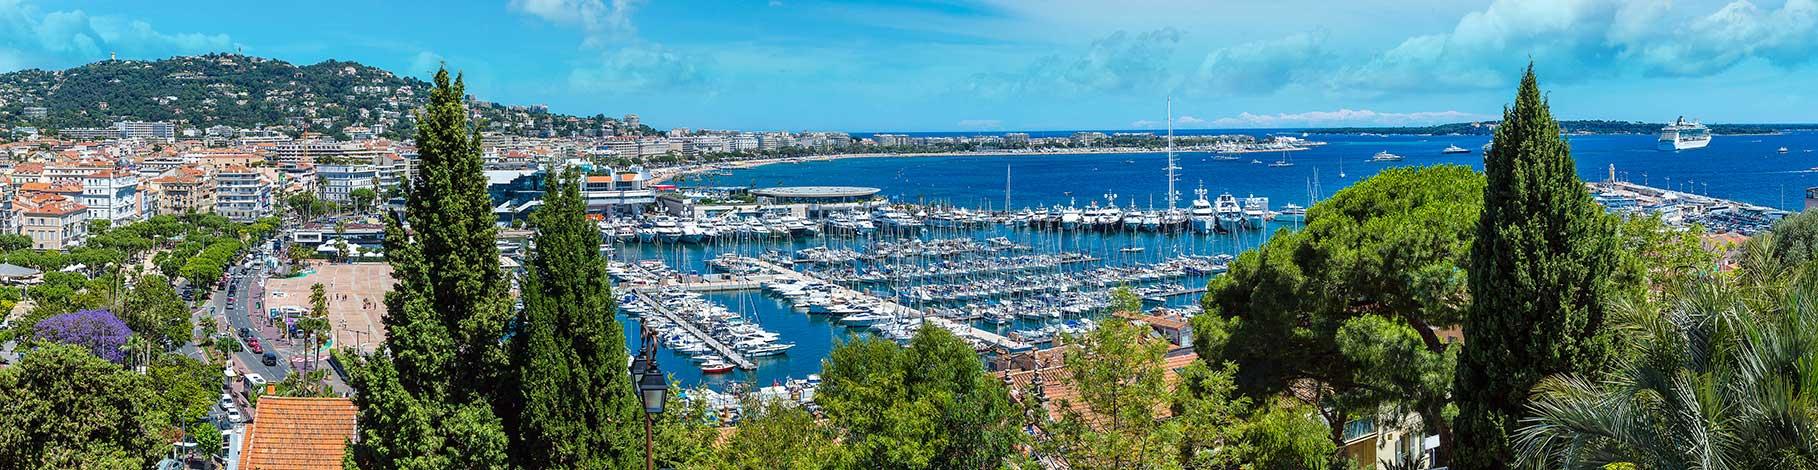 Cannes harbour sea front